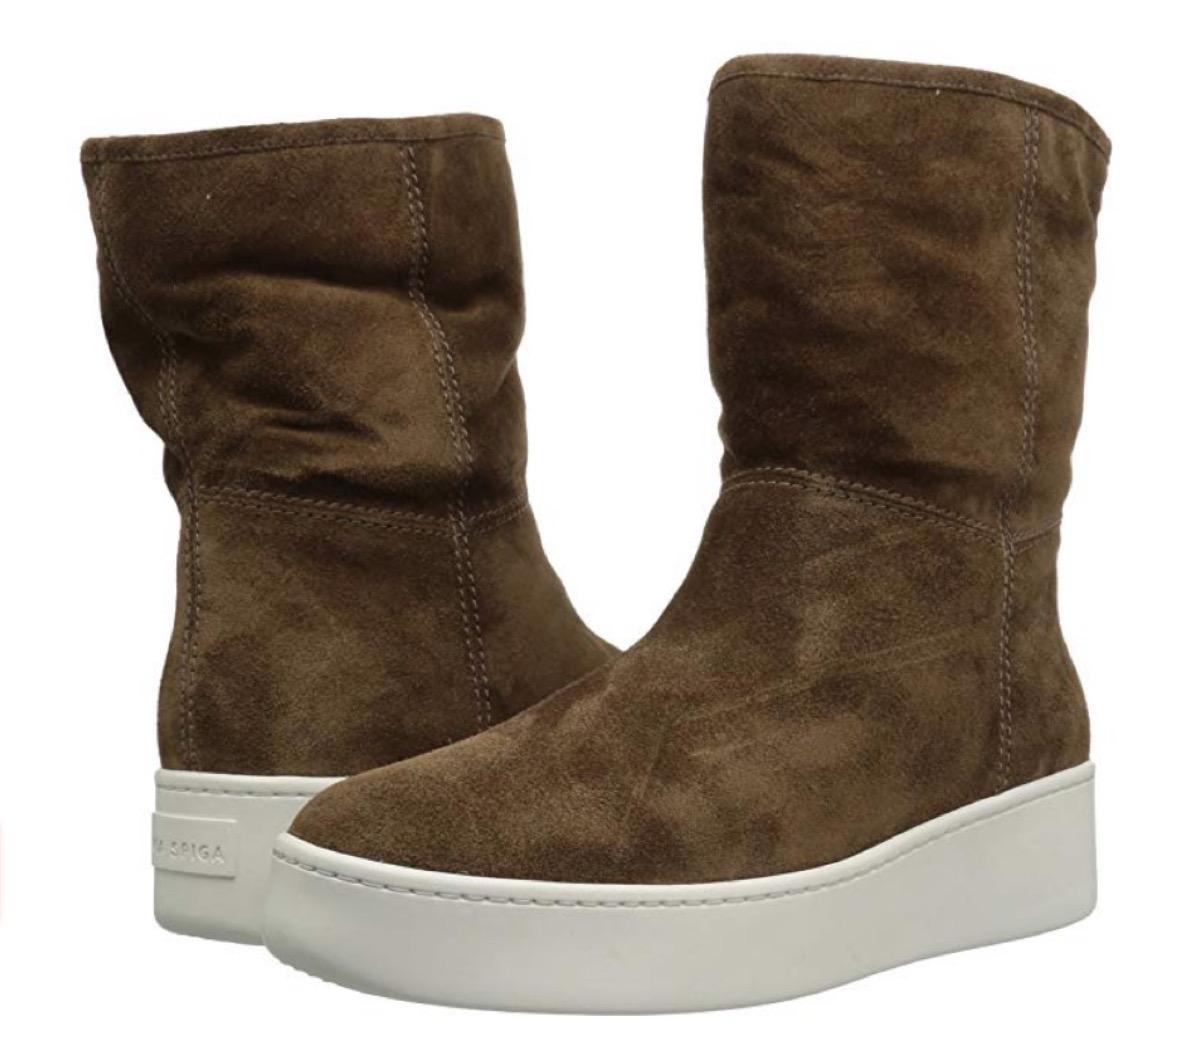 brown suede sneaker boots